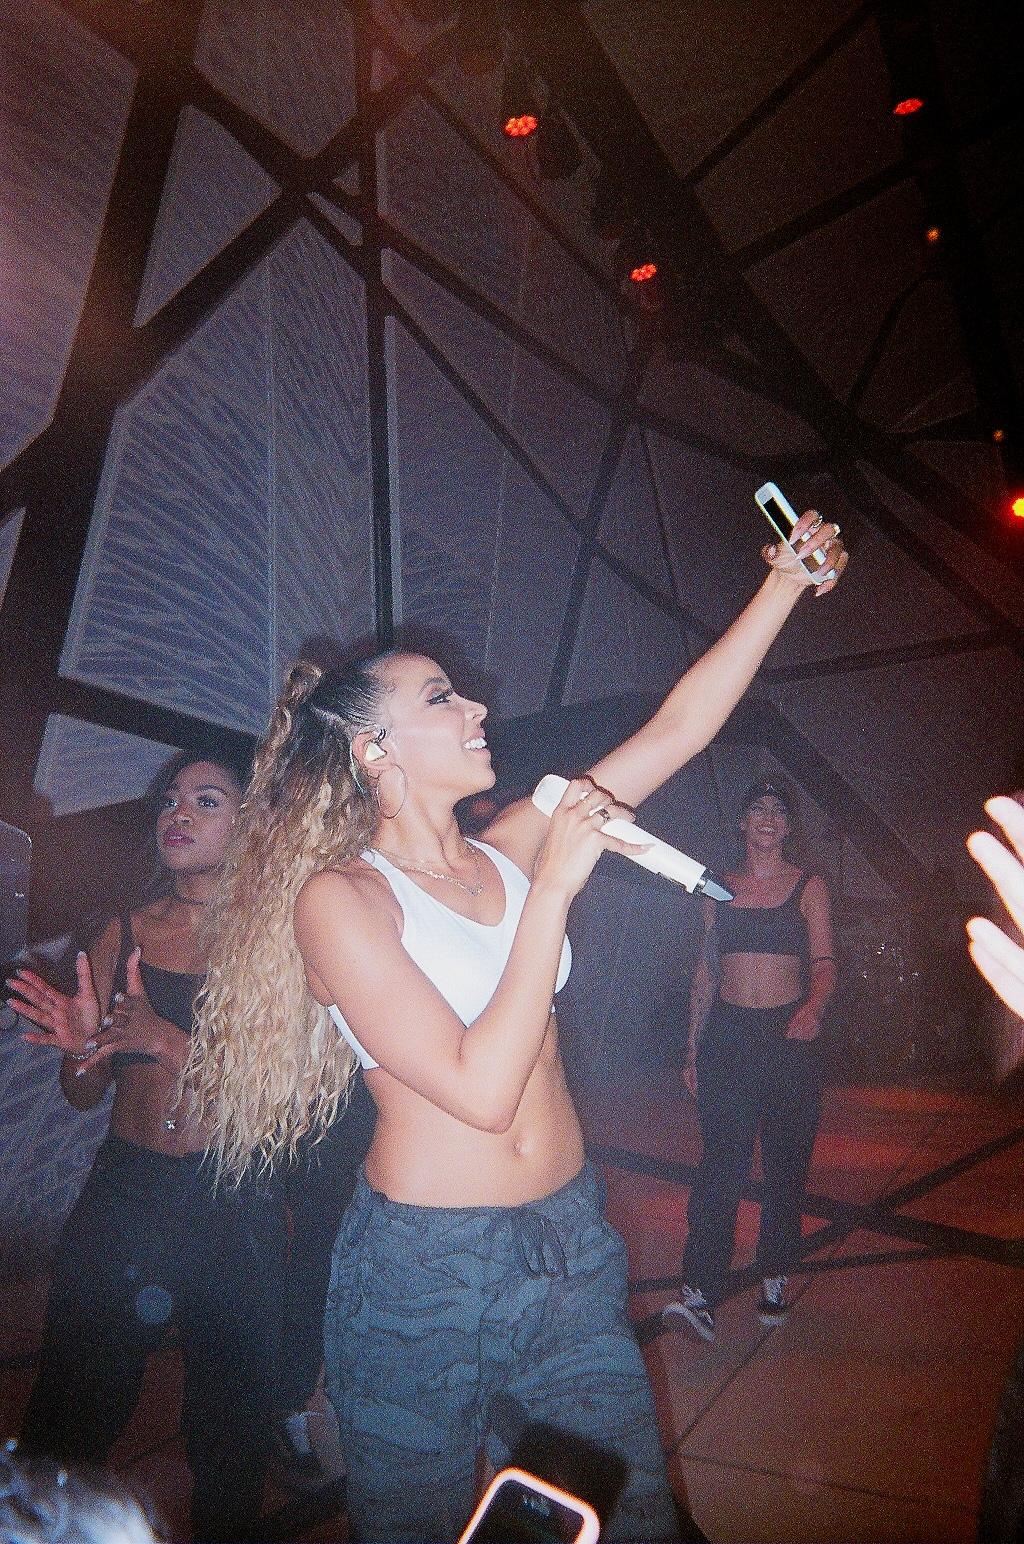 Tinashe - shot by @chrixtophwalsh